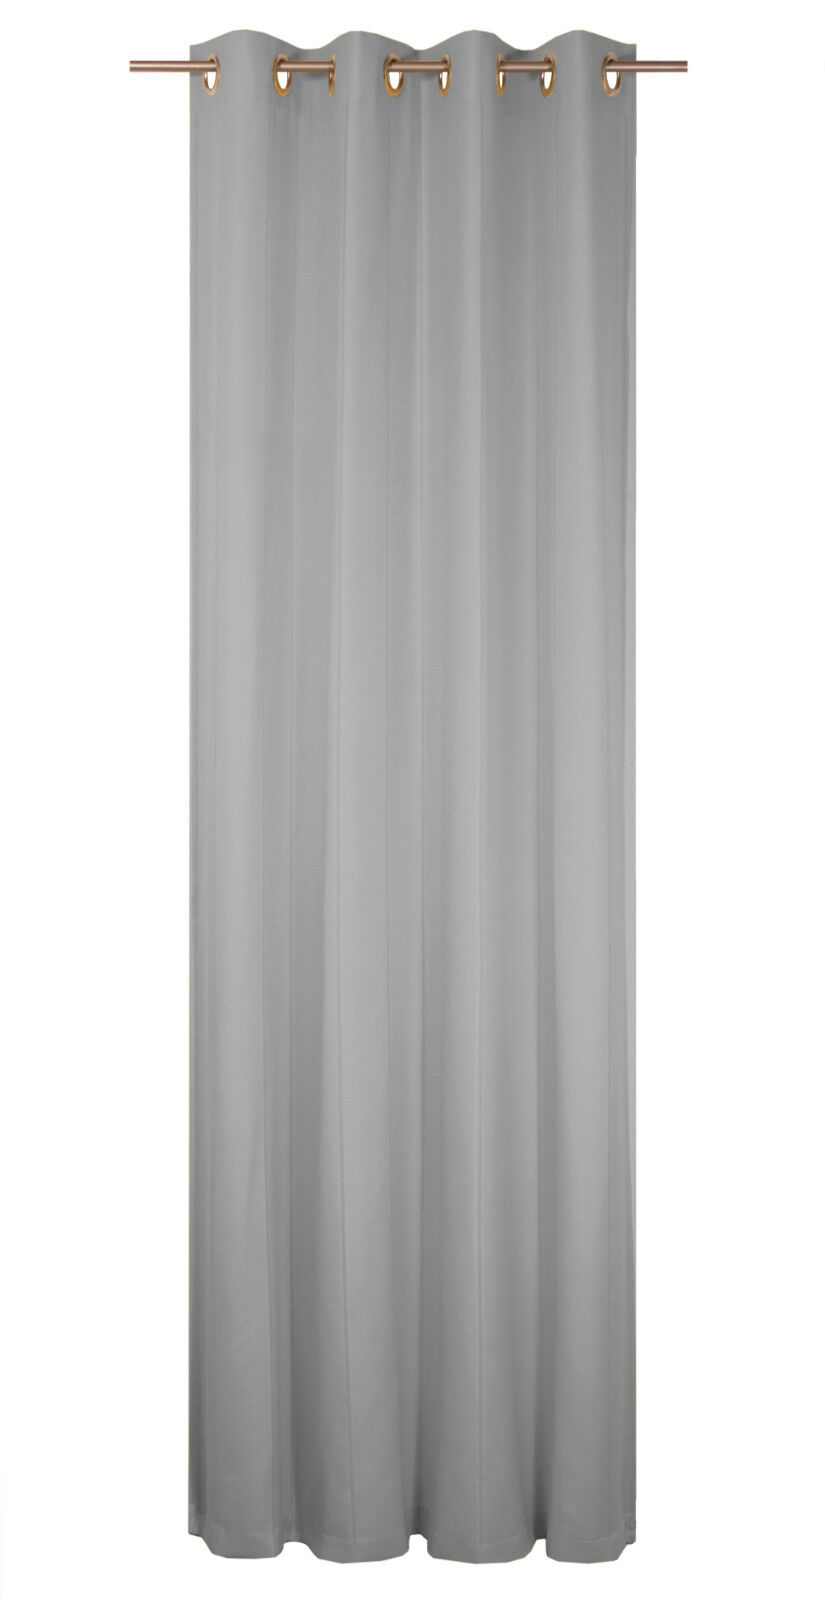 Fertiggardine     Ösenschal Felsted Farbe 970 grau   5 Größen | Hohe Qualität und günstig  693db8